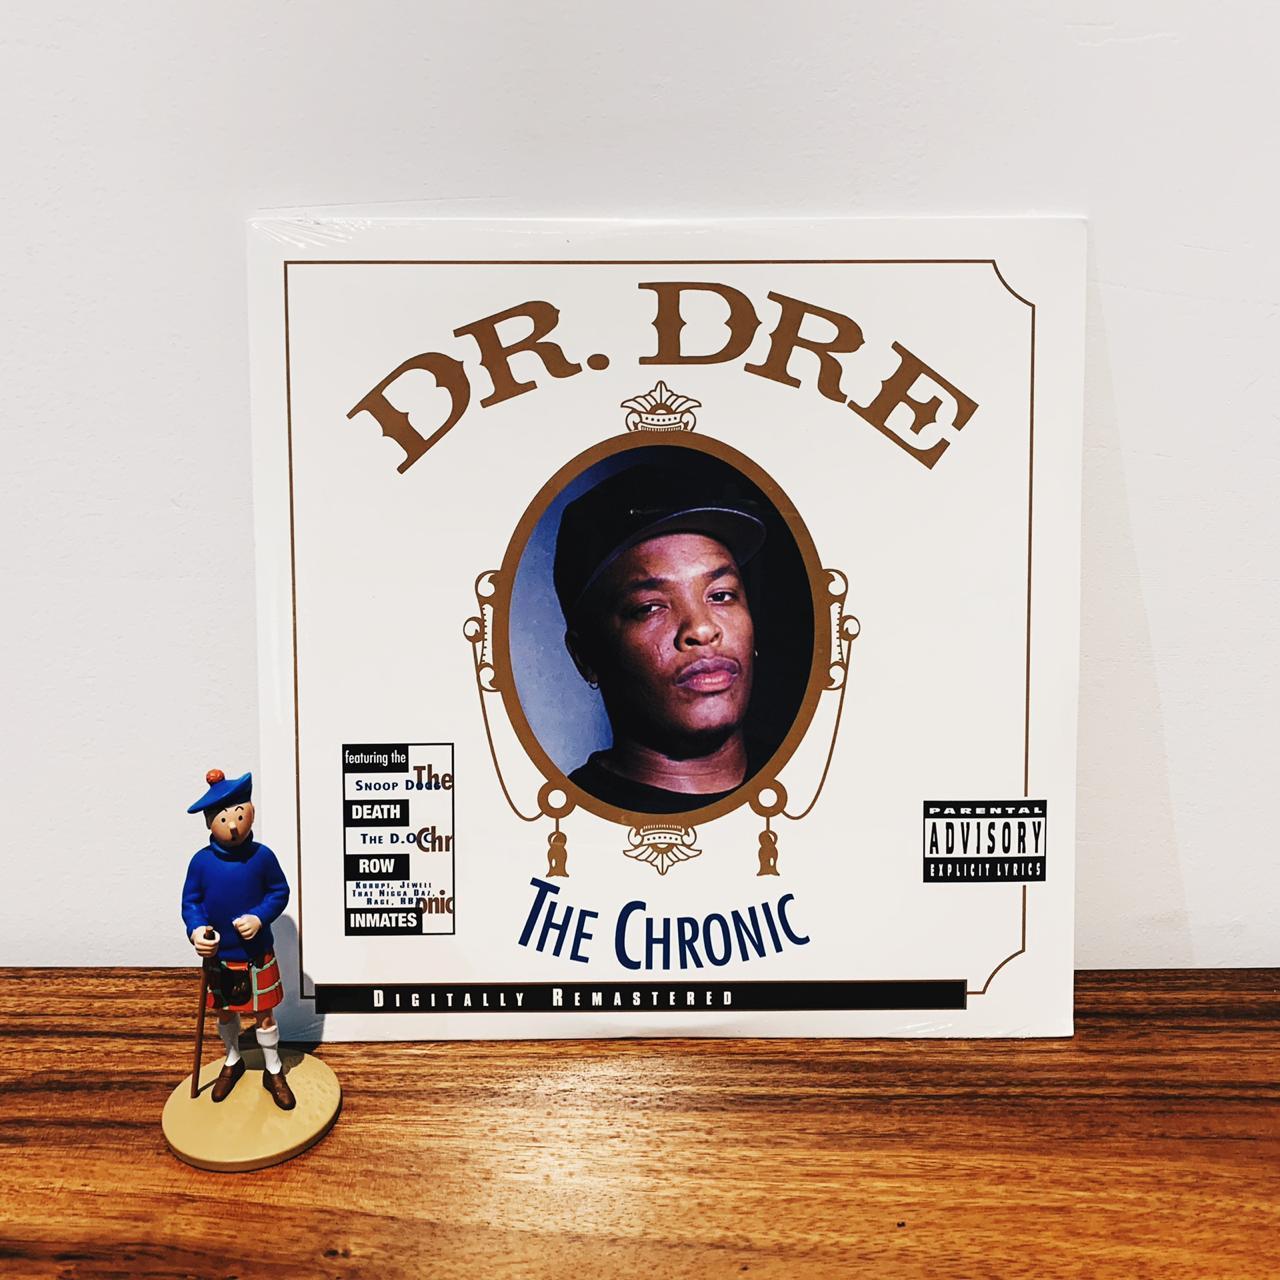 Piringan Hitam / Vinyl / Lp Dr. Dre - Chronic By Playlist Record Store